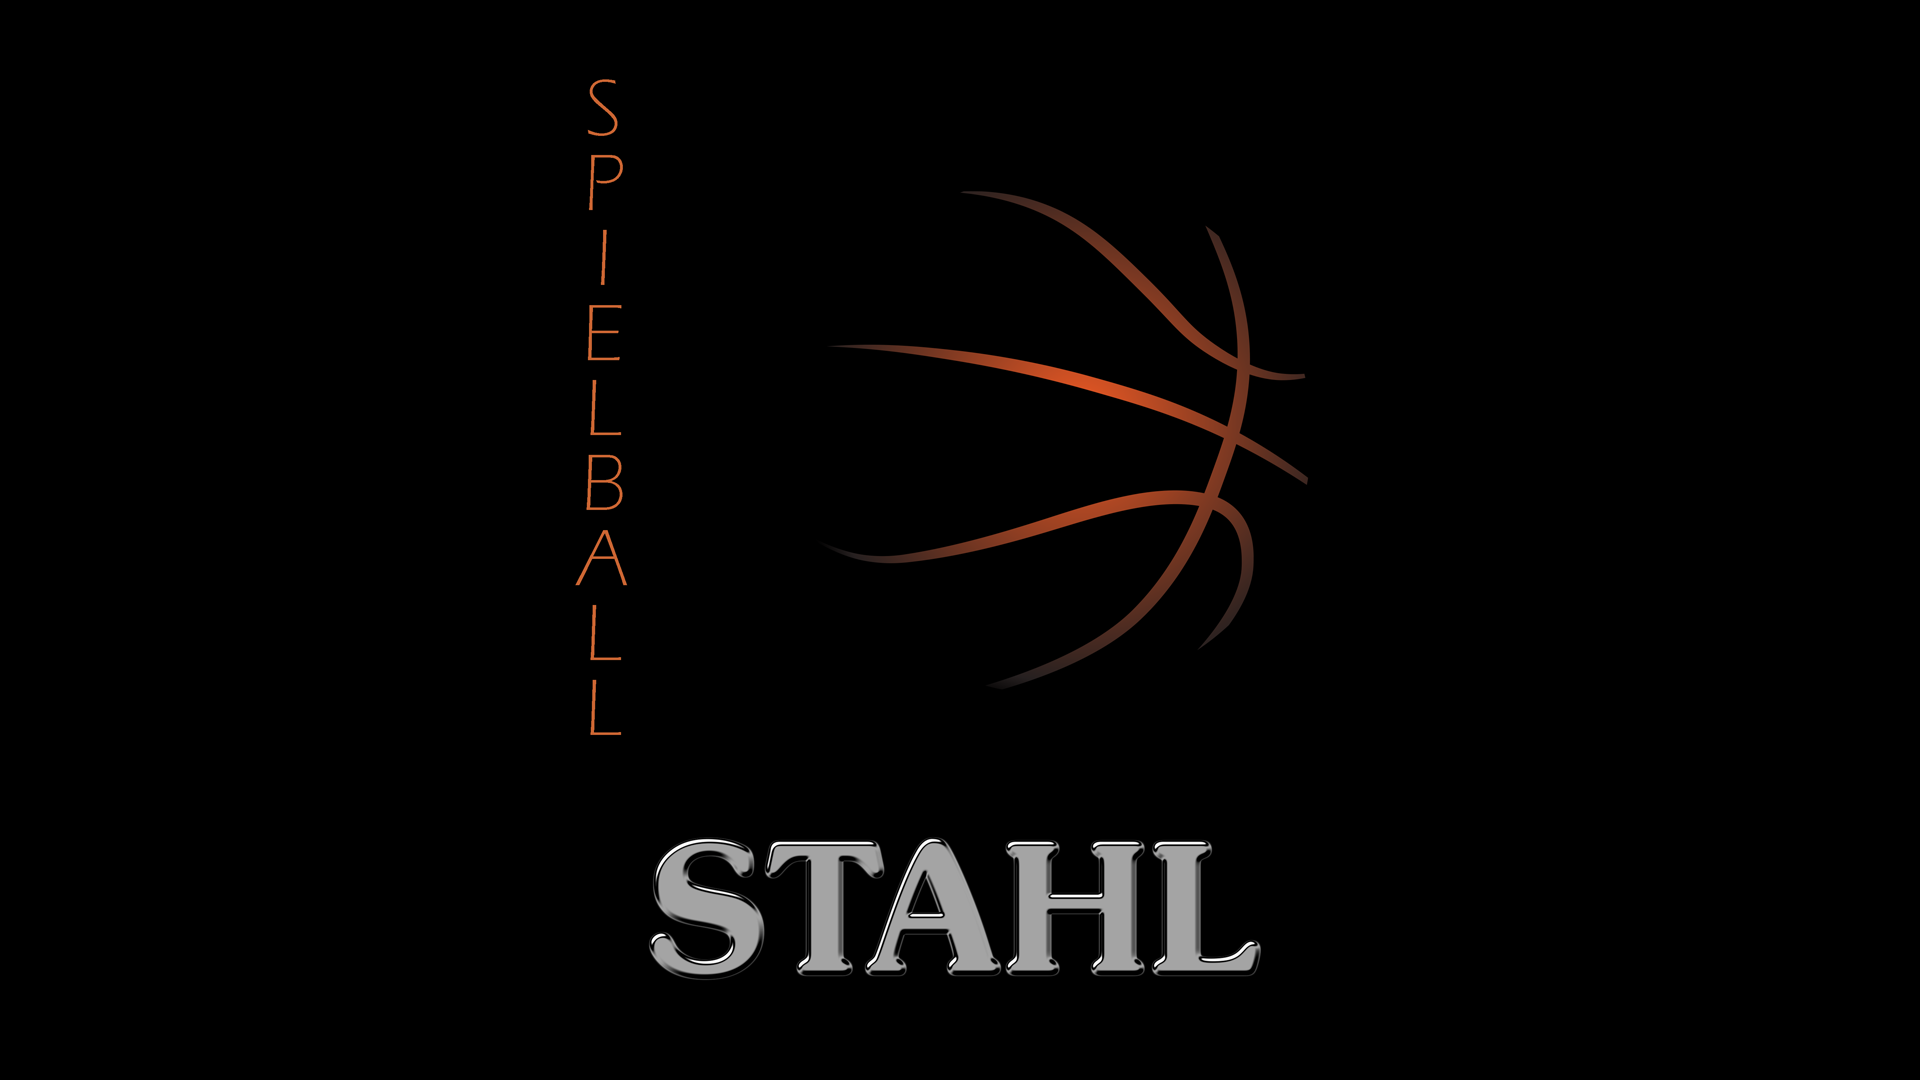 STAHL - Spielball